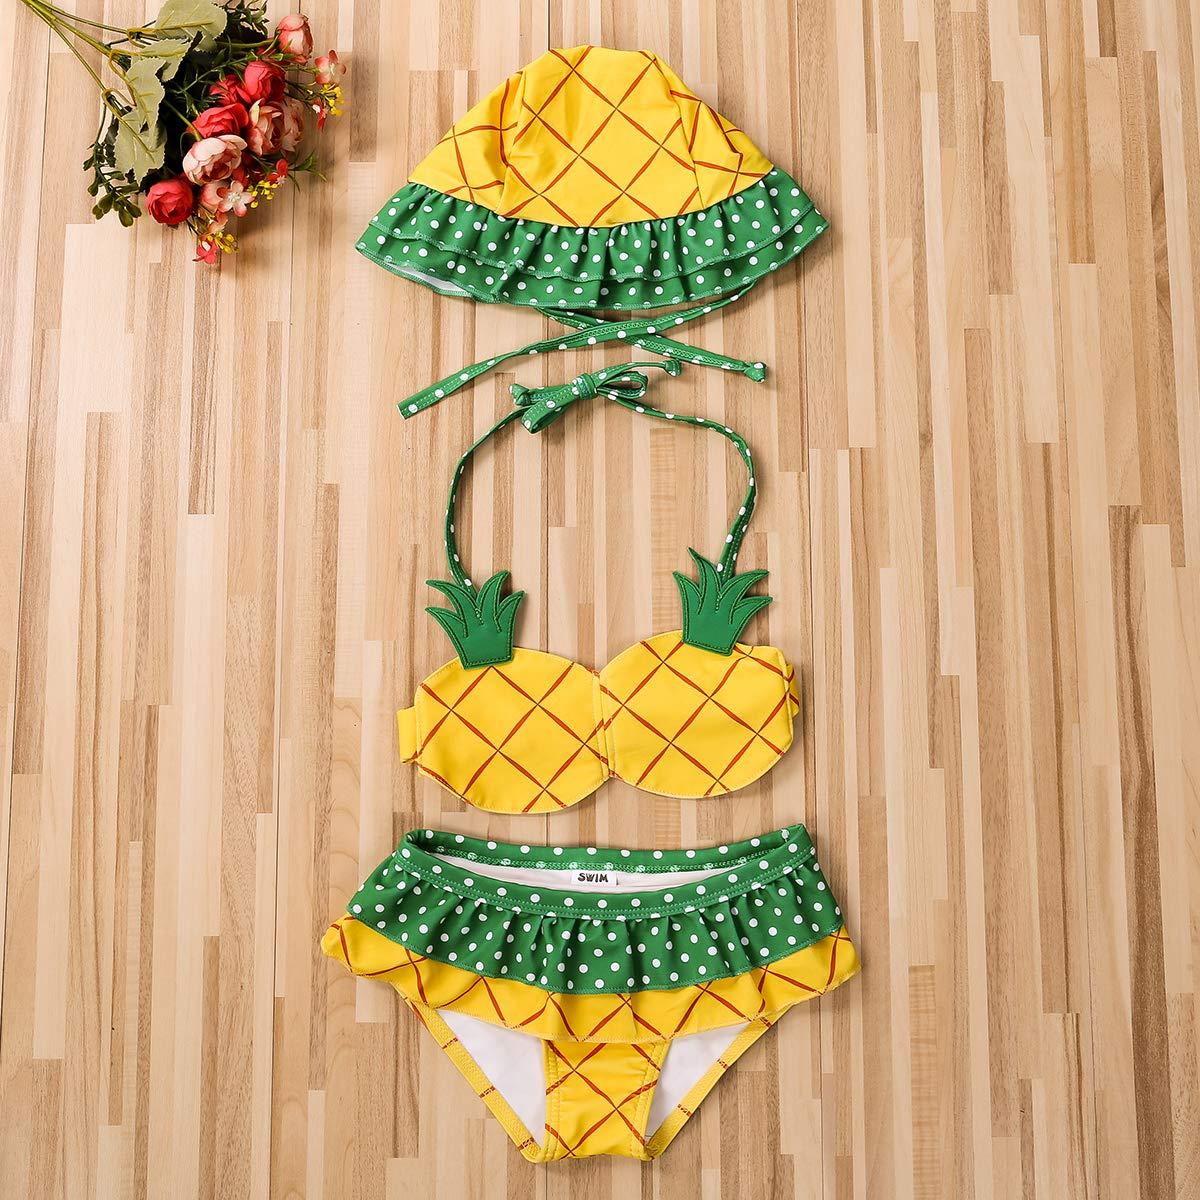 Listogether Toddler Kids Baby Girls Cute Pineapple Bikini Swimwear Summer Beach Tankini Swimsuit Bathing Suit Beachwear